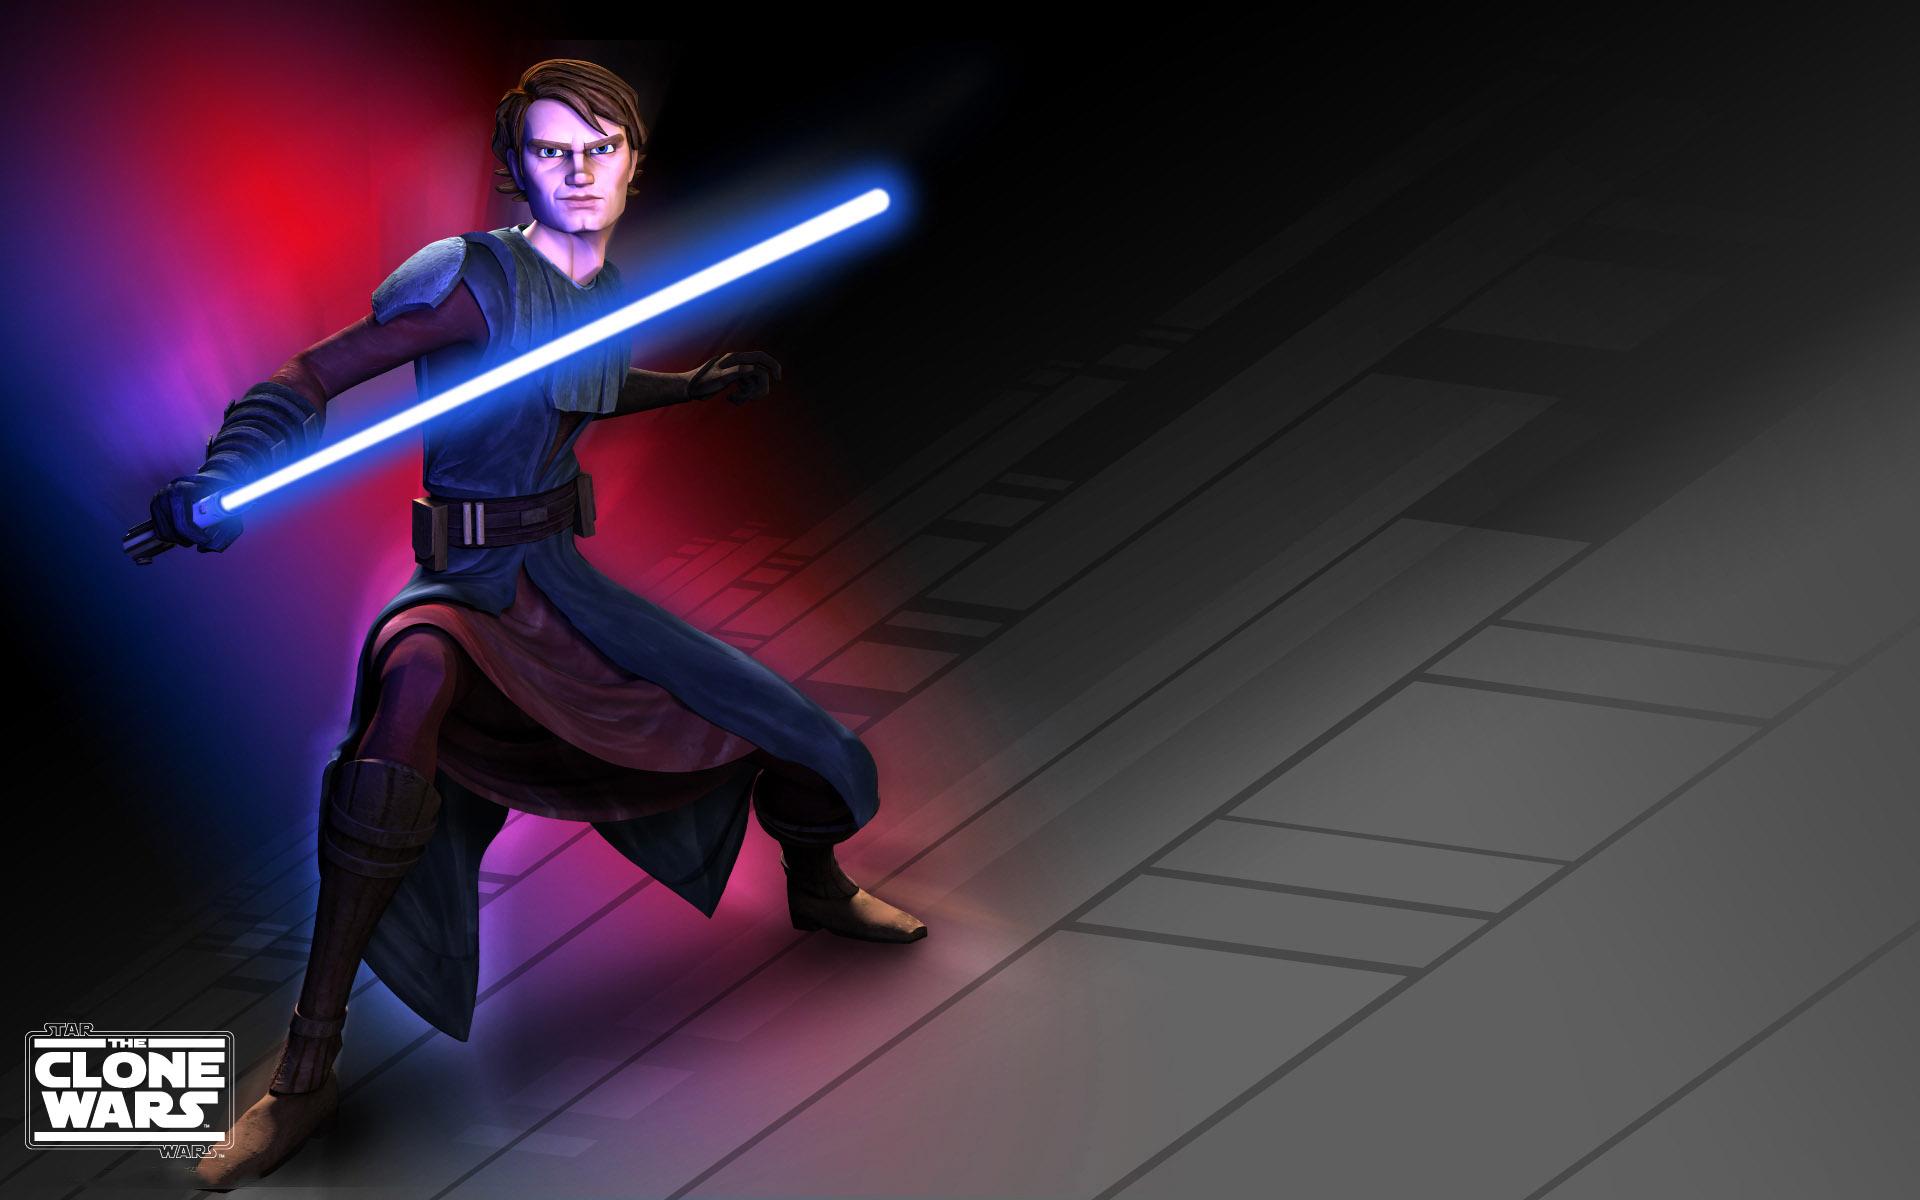 Anakin Skywalker Star Wars The Clone Wars Hd Wallpaper